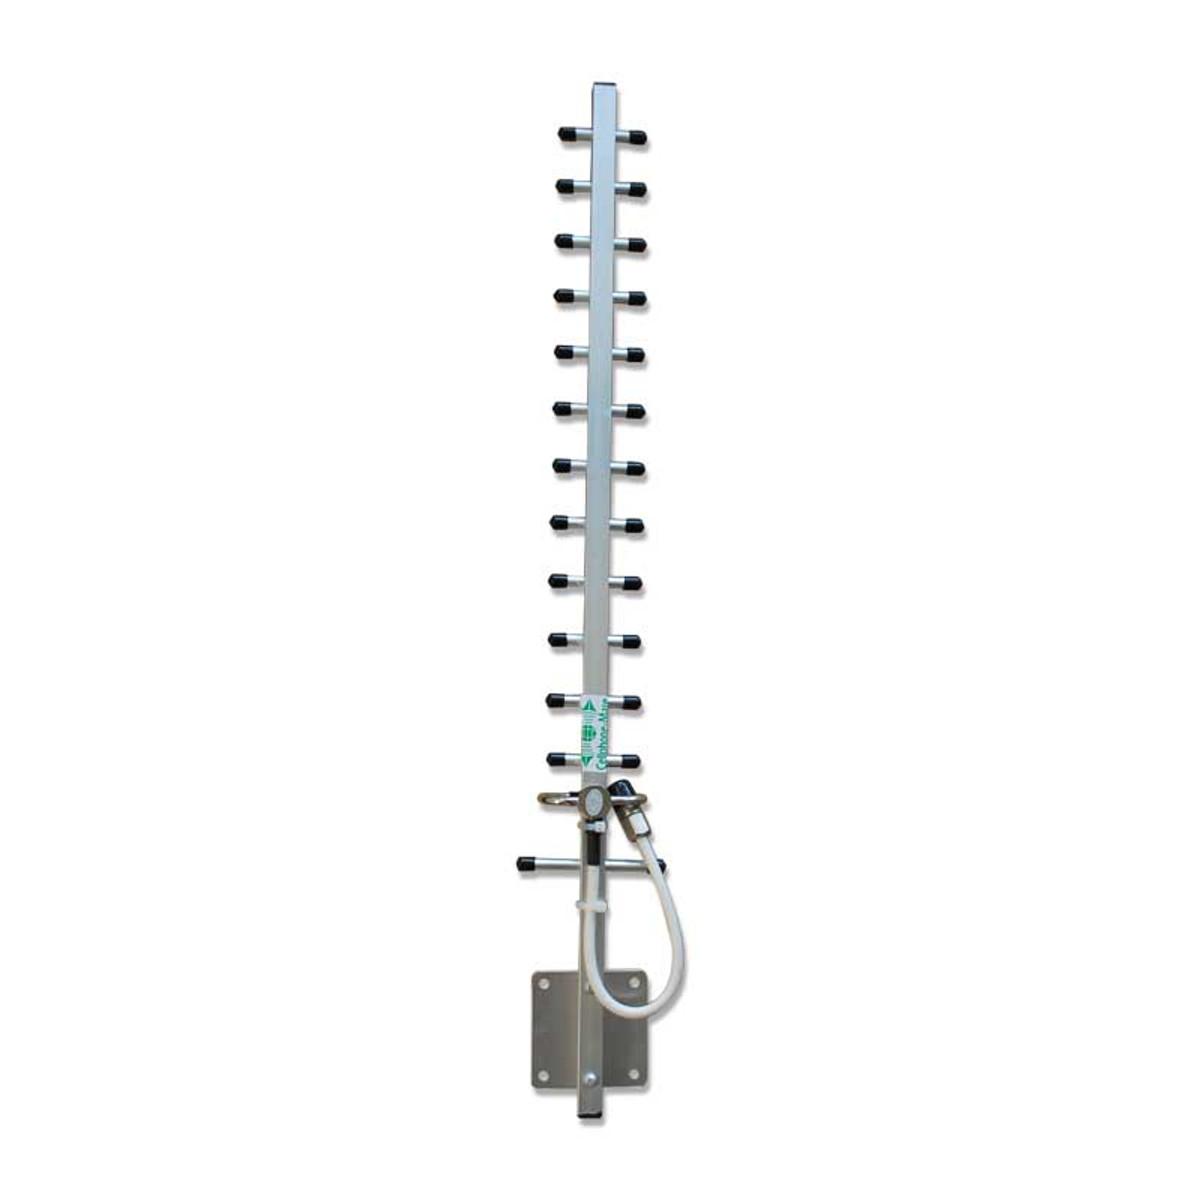 SureCall 800 MHz Yagi Antenna | SC-230-800